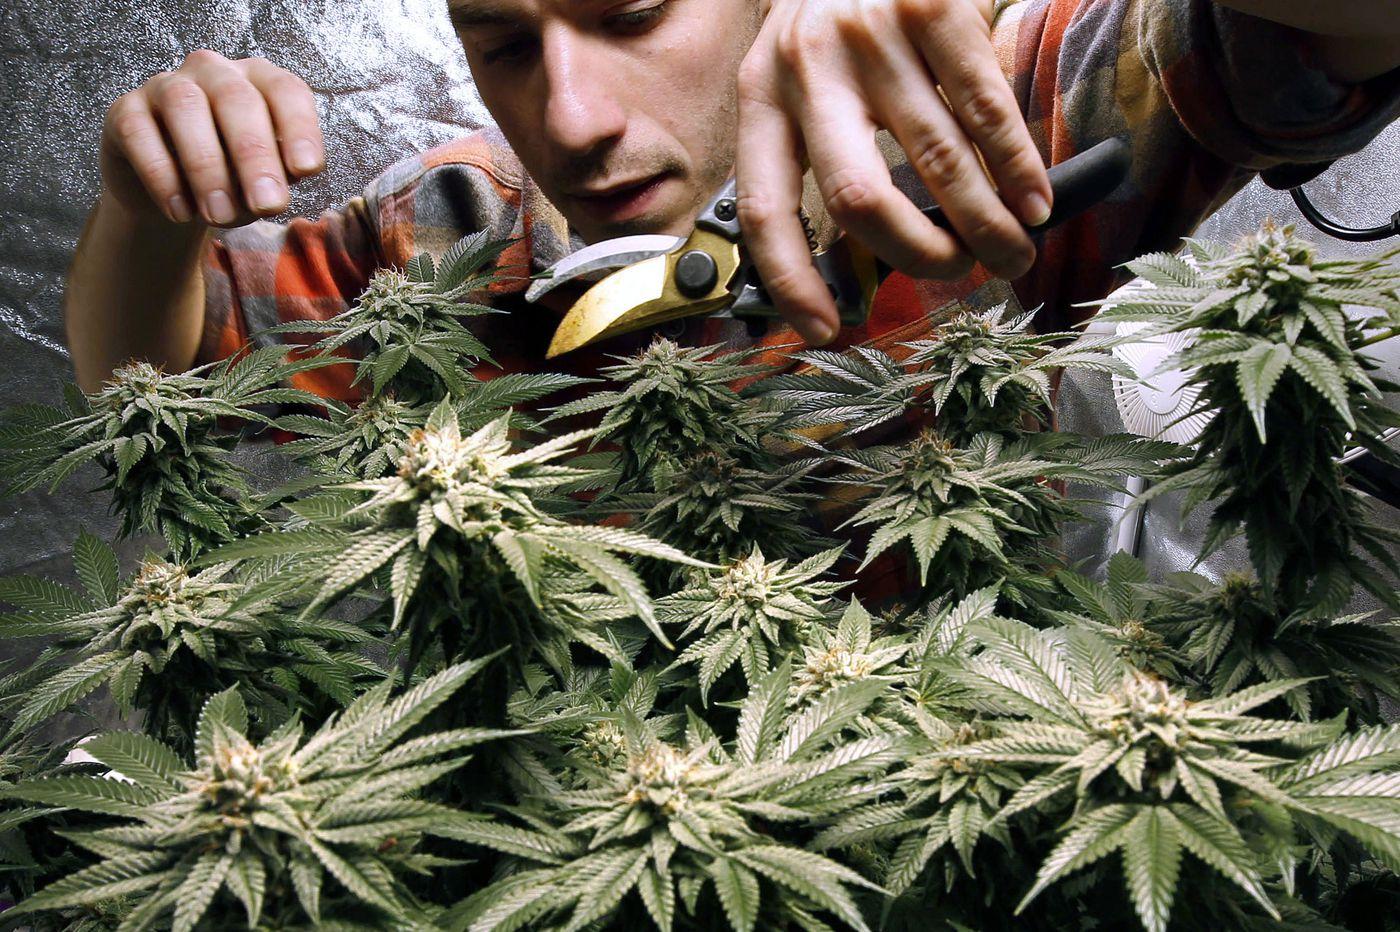 Large majority favors New Jersey marijuana legalization, according to poll